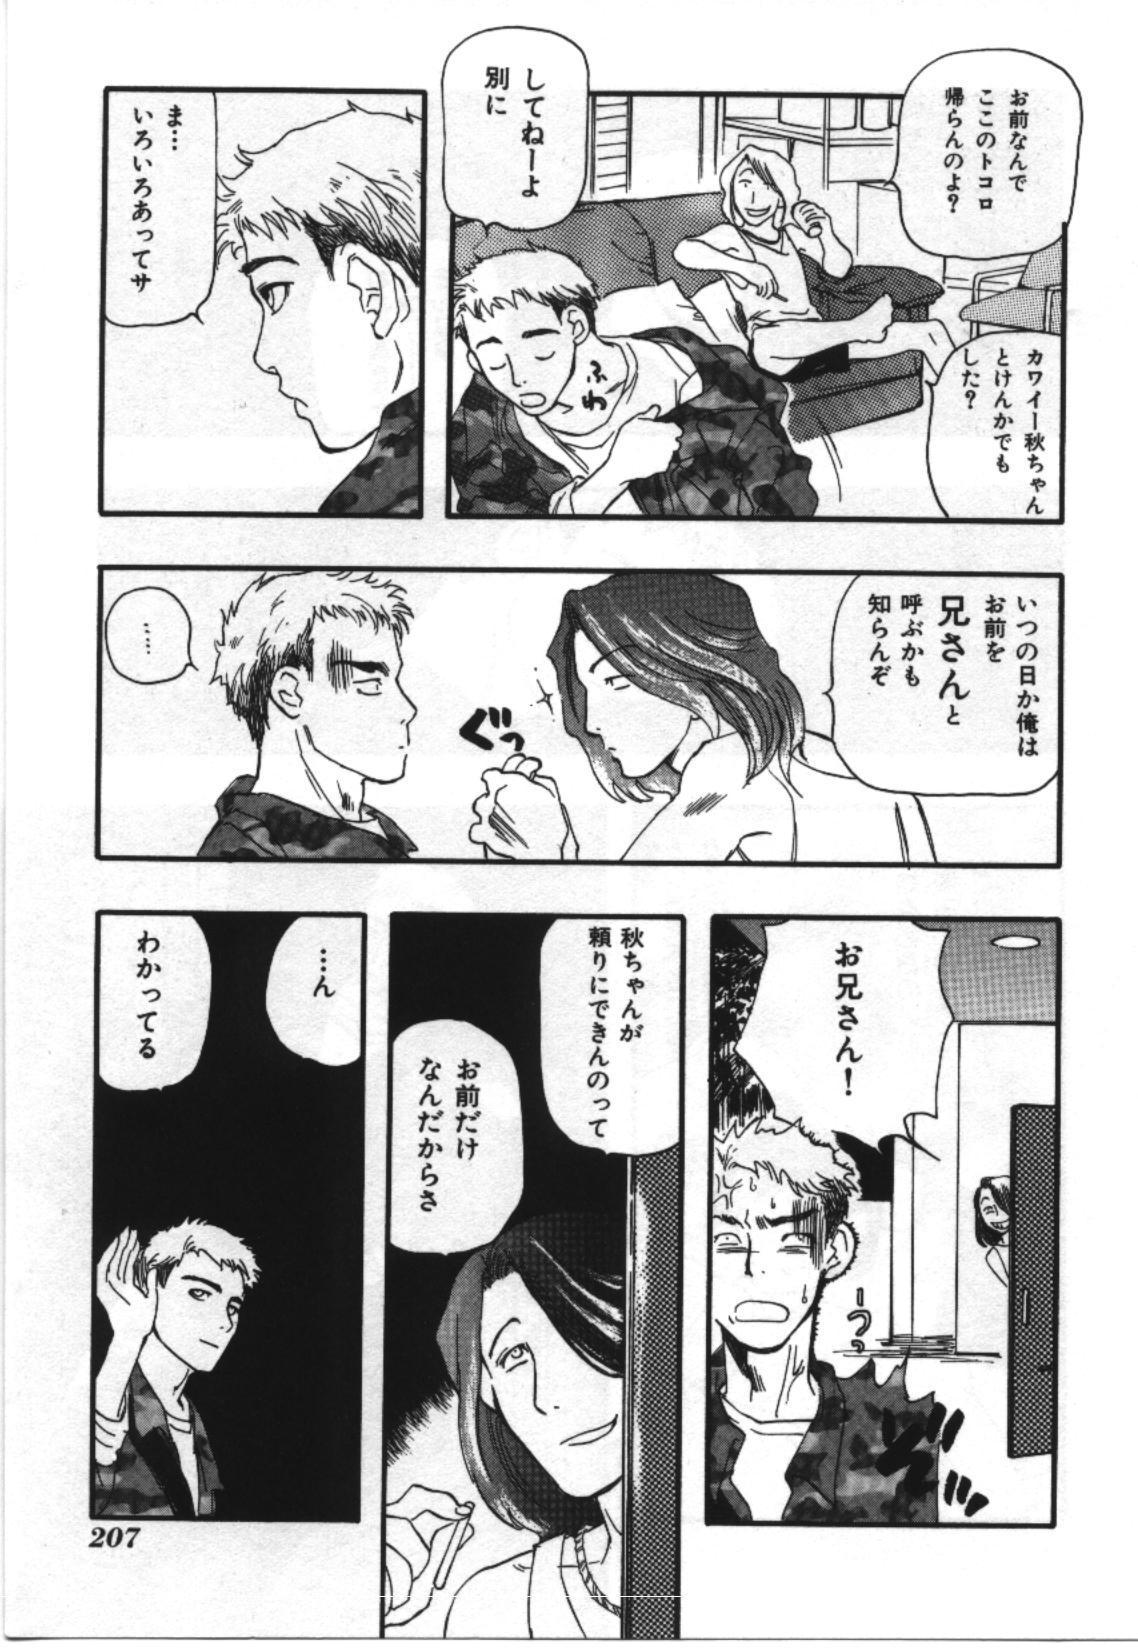 Imouto Koishi 2 206